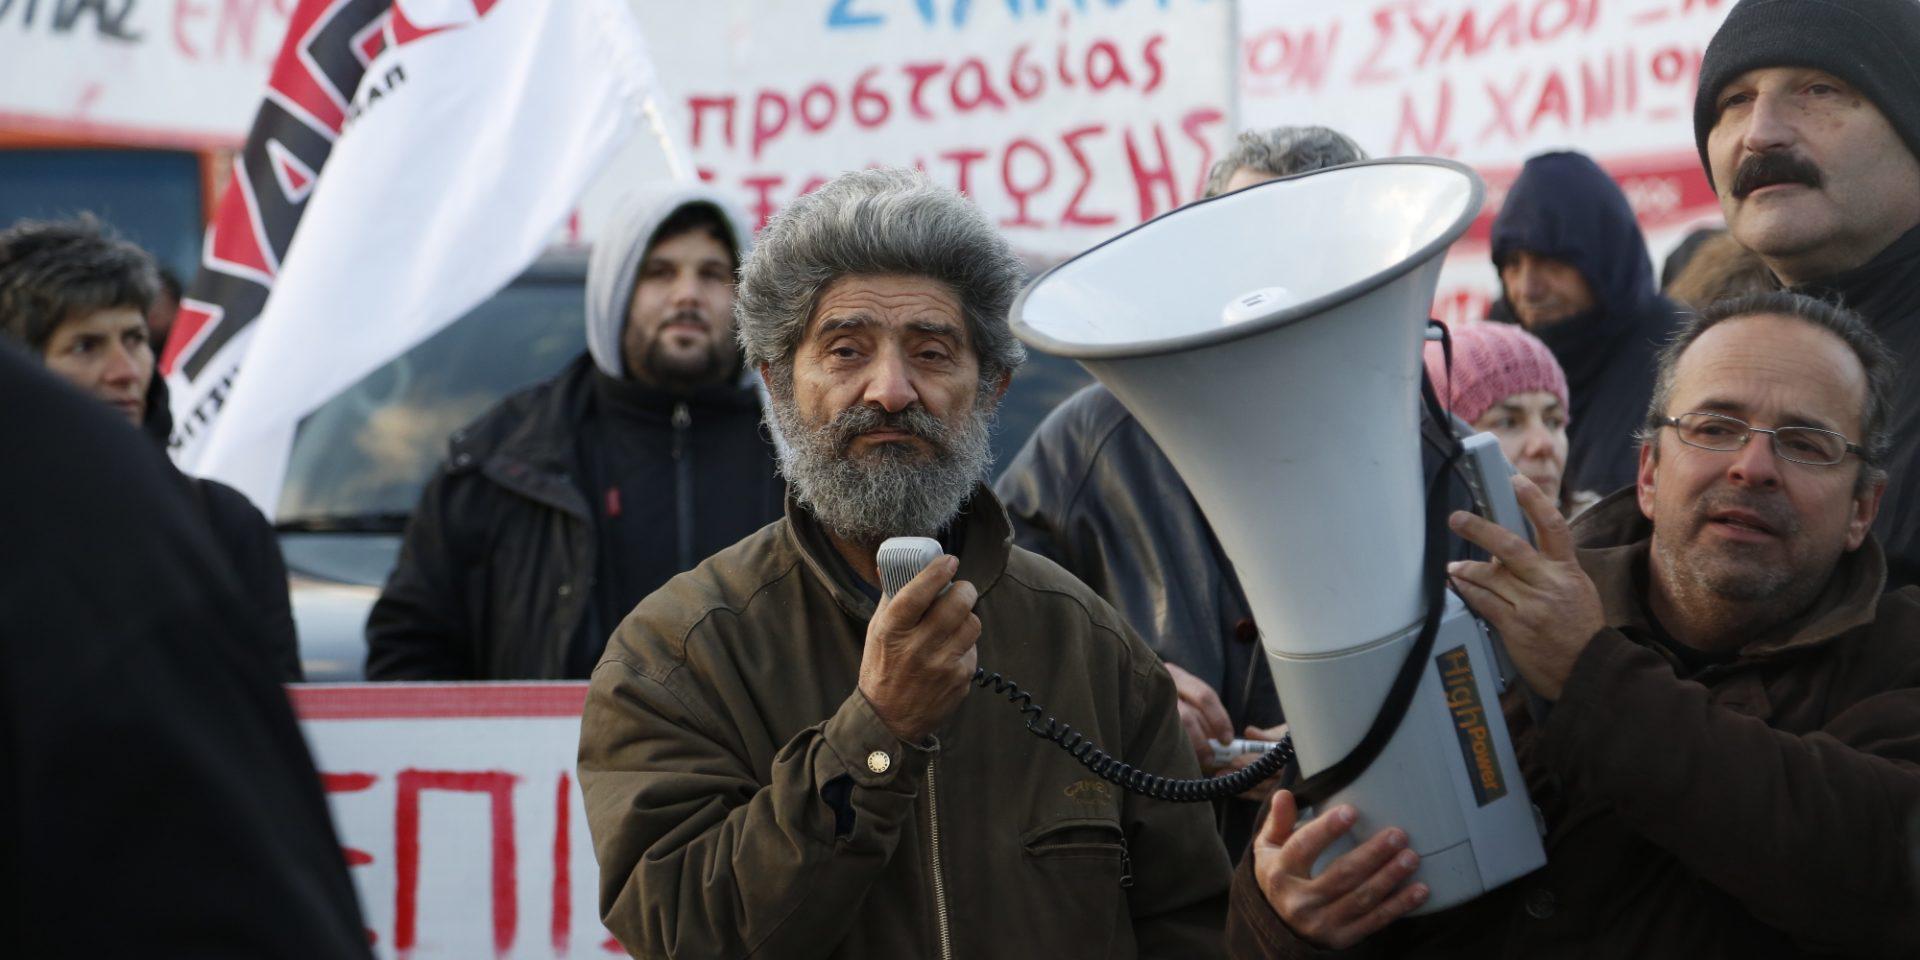 sullaritirio-agrotes-1000 Στην Βουλή οι αγρότες – Σε εξέλιξη το μεγάλο συλλαλητήριο